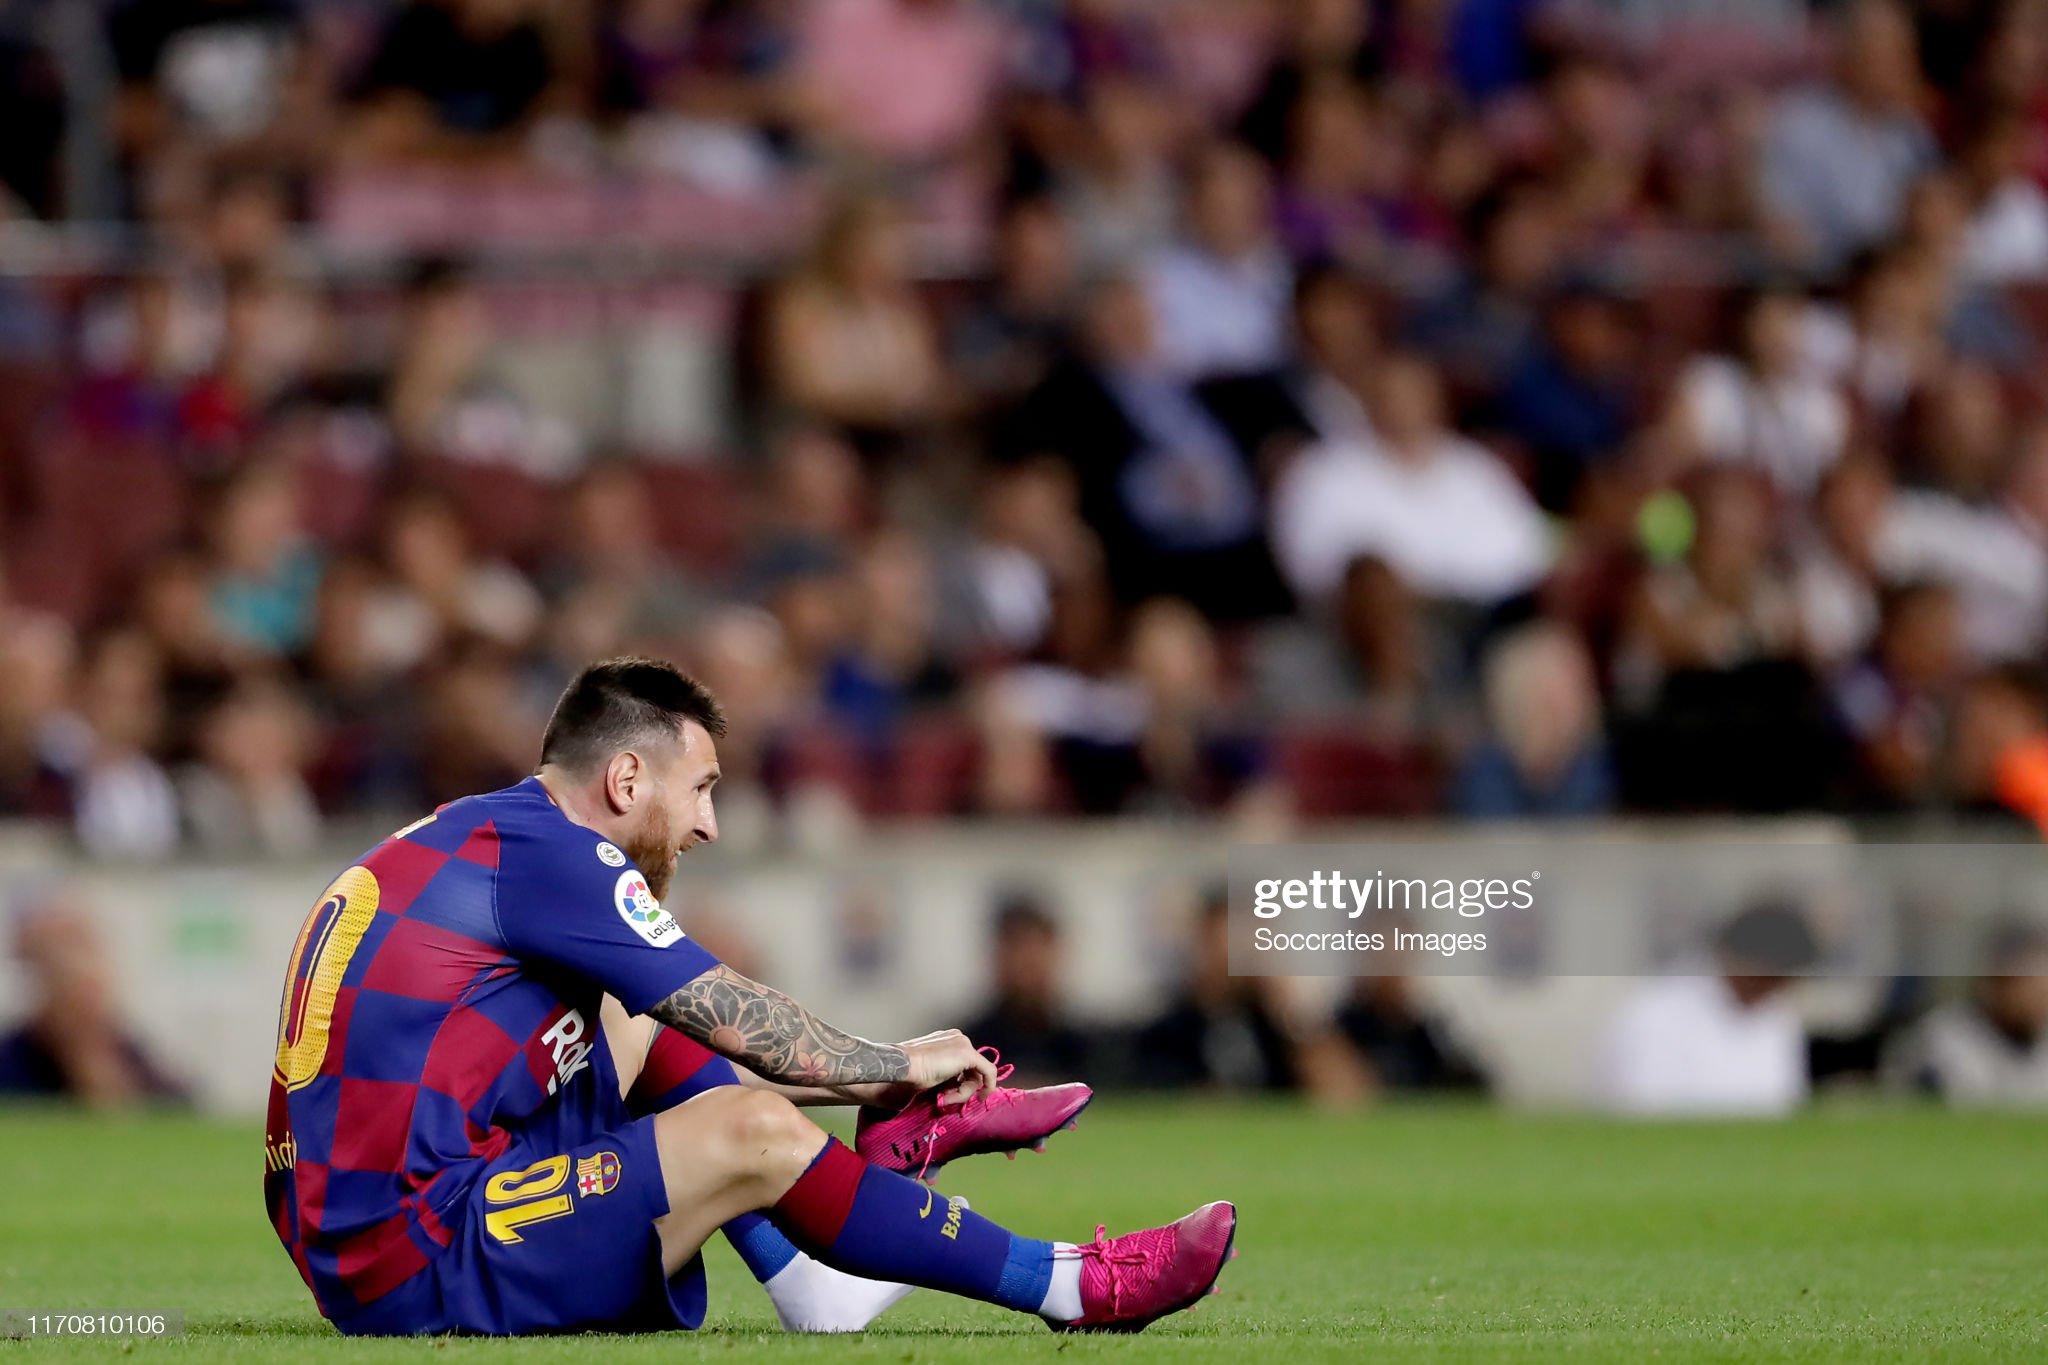 صور مباراة : برشلونة - فياريال 2-1 ( 24-09-2019 )  Lionel-messi-of-fc-barcelona-during-the-la-liga-santander-match-fc-picture-id1170810106?s=2048x2048